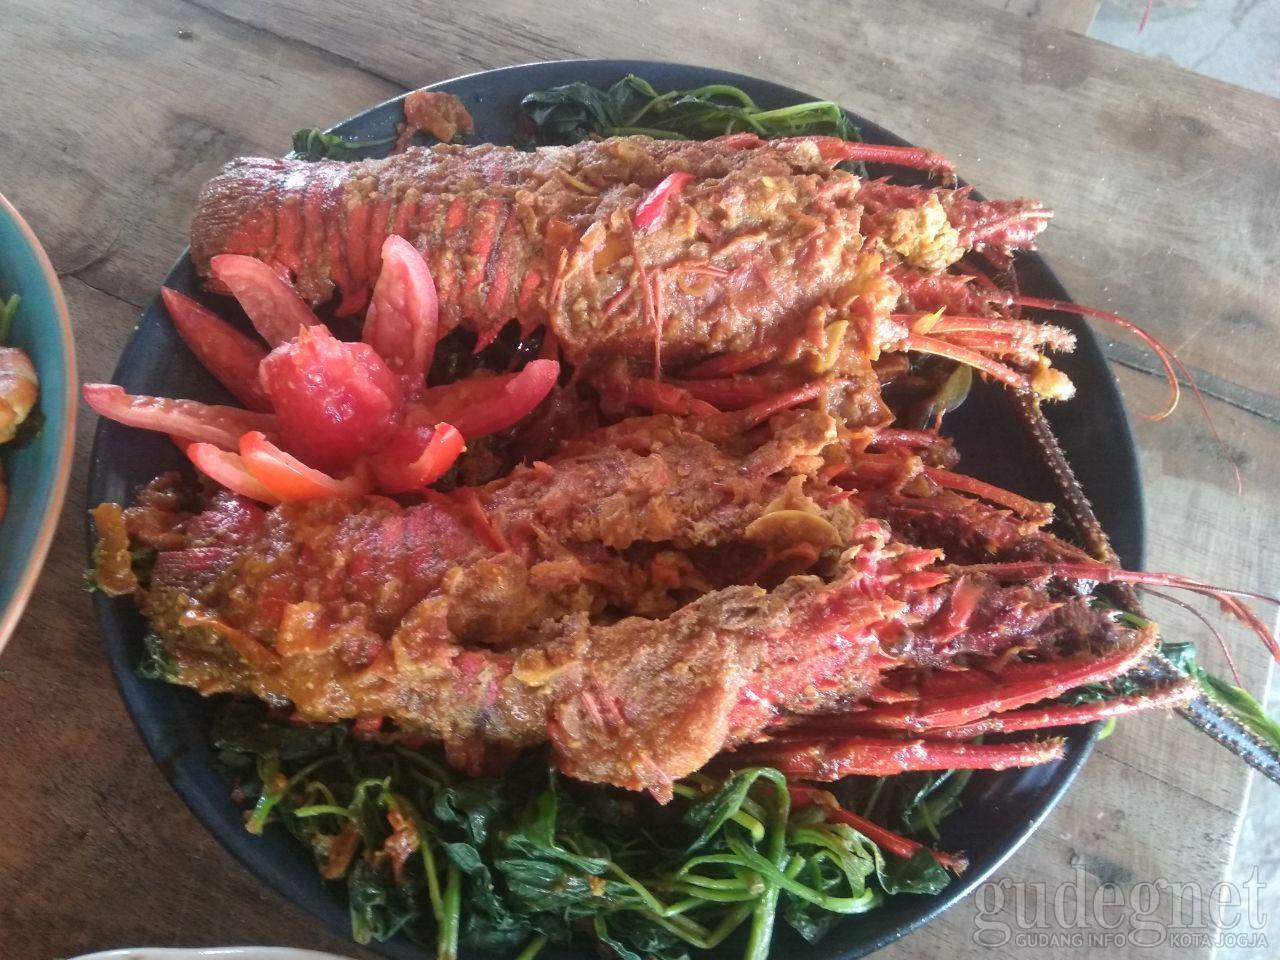 Mantapnya Lobster Asam Manis ala Warung Pondok Sundak